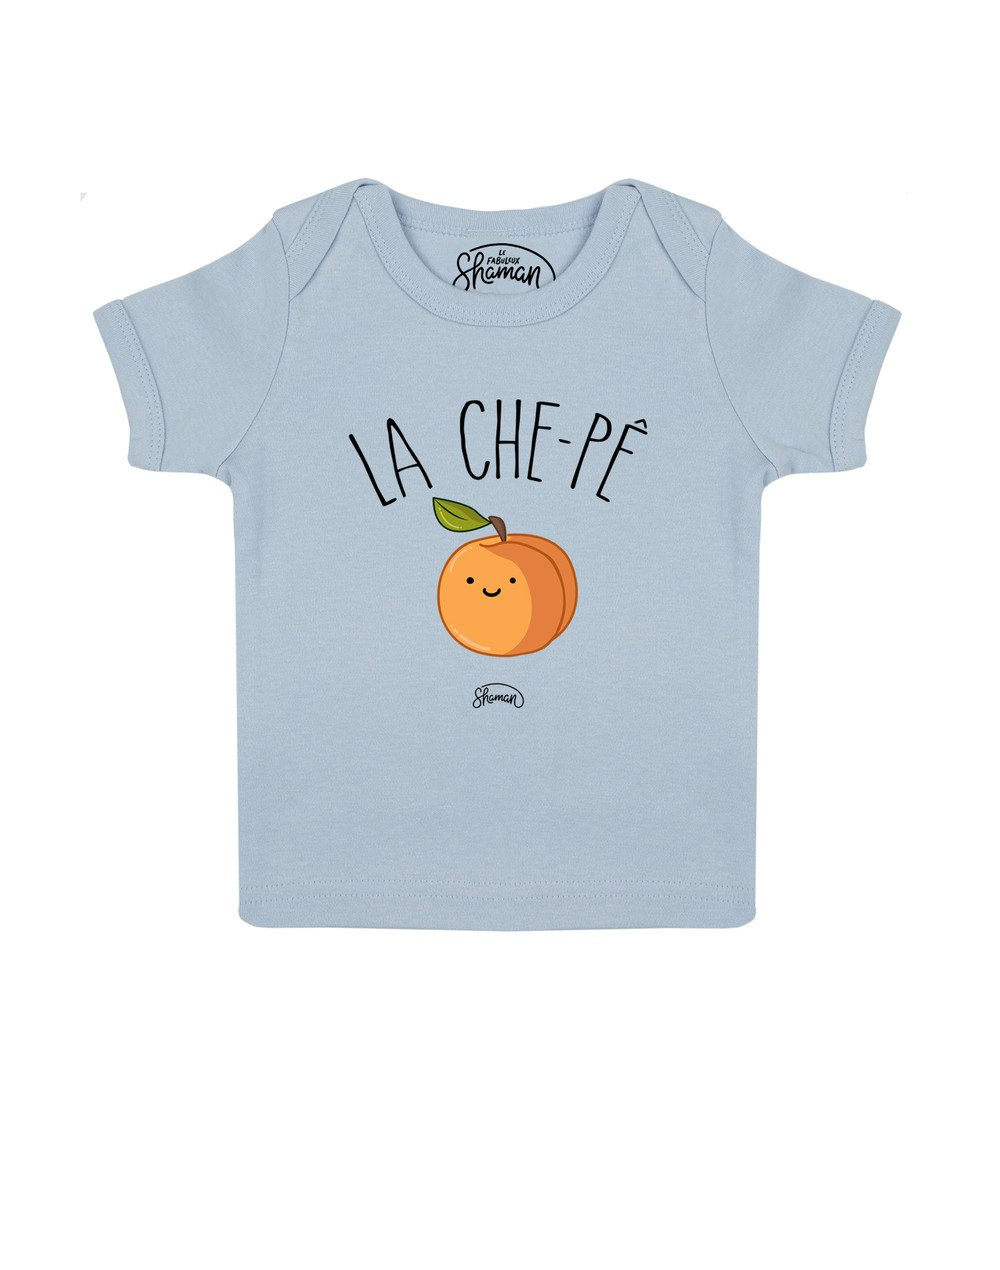 Tee shirt La che-pé